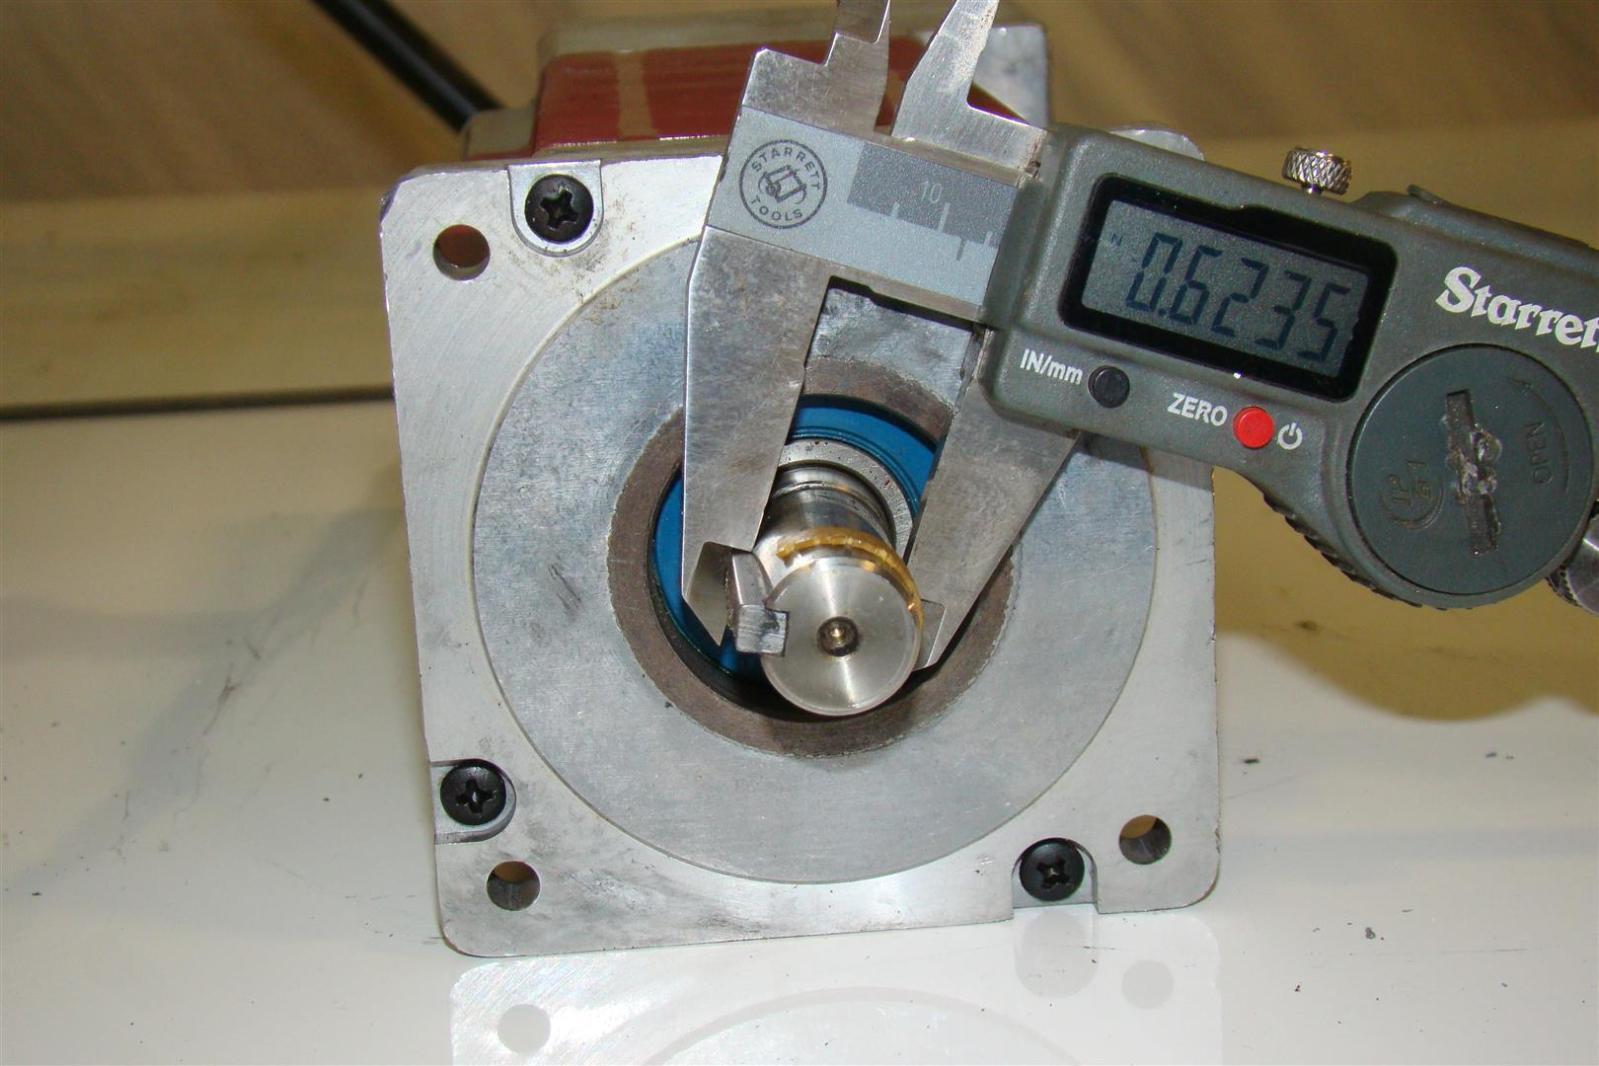 Danaher Motion Pacific Scientific K33hlhj Lnk Ns 00 Powerpac Step Motor K33hlhj Lnk Ns 00